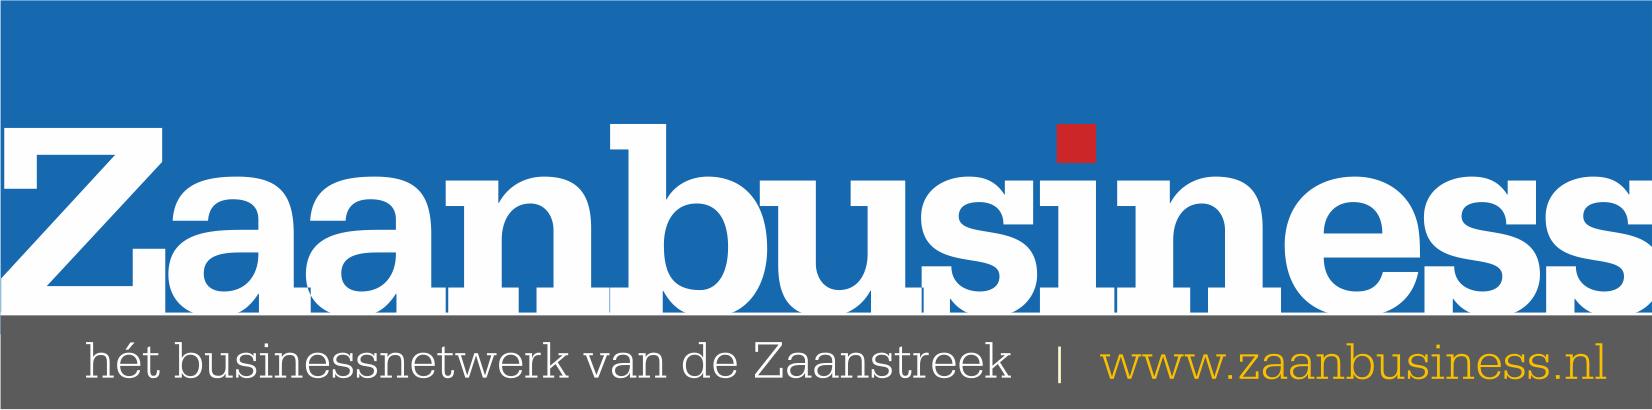 Zaanbusiness